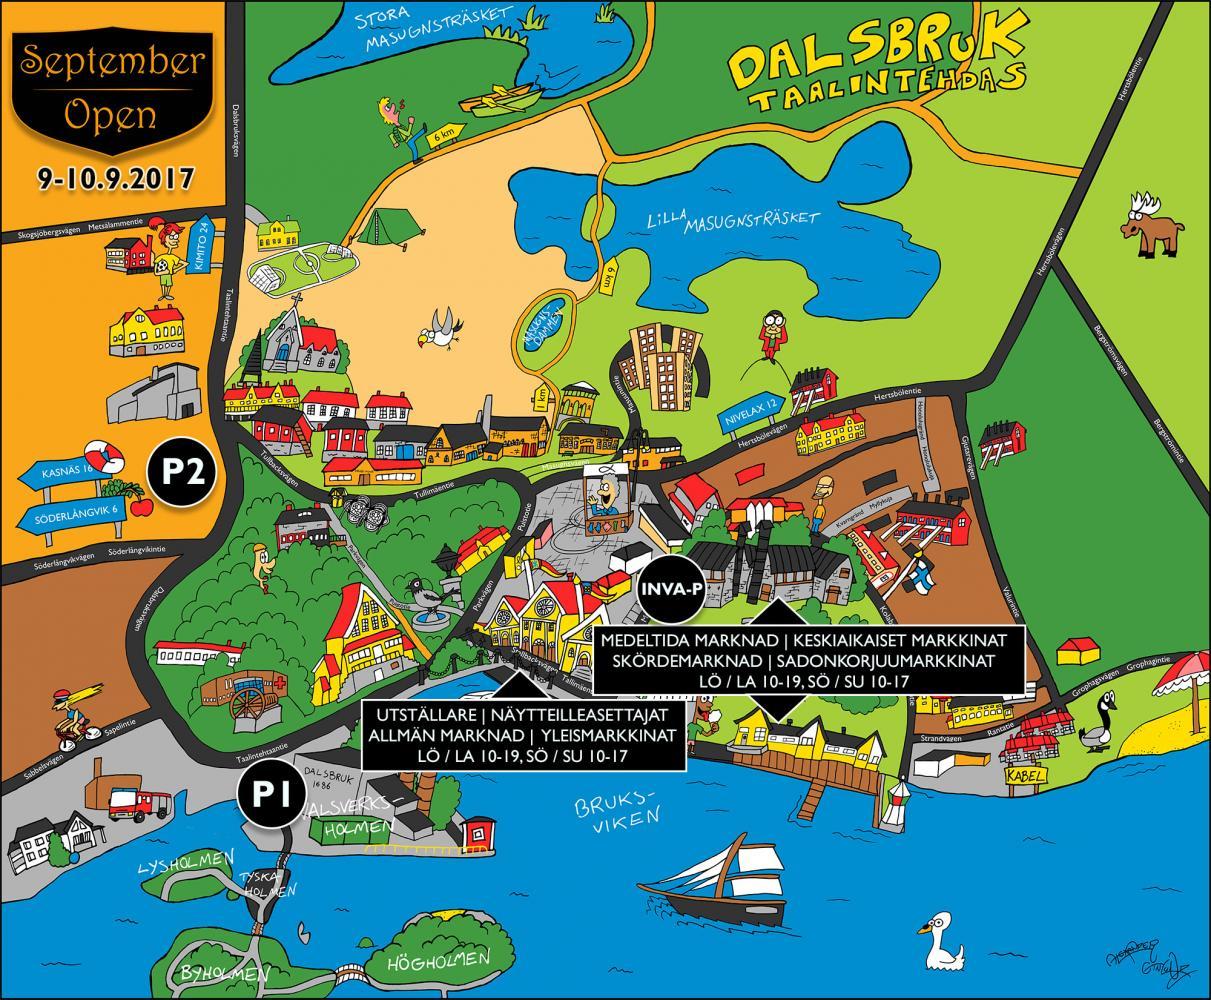 September Open utstallarkarta